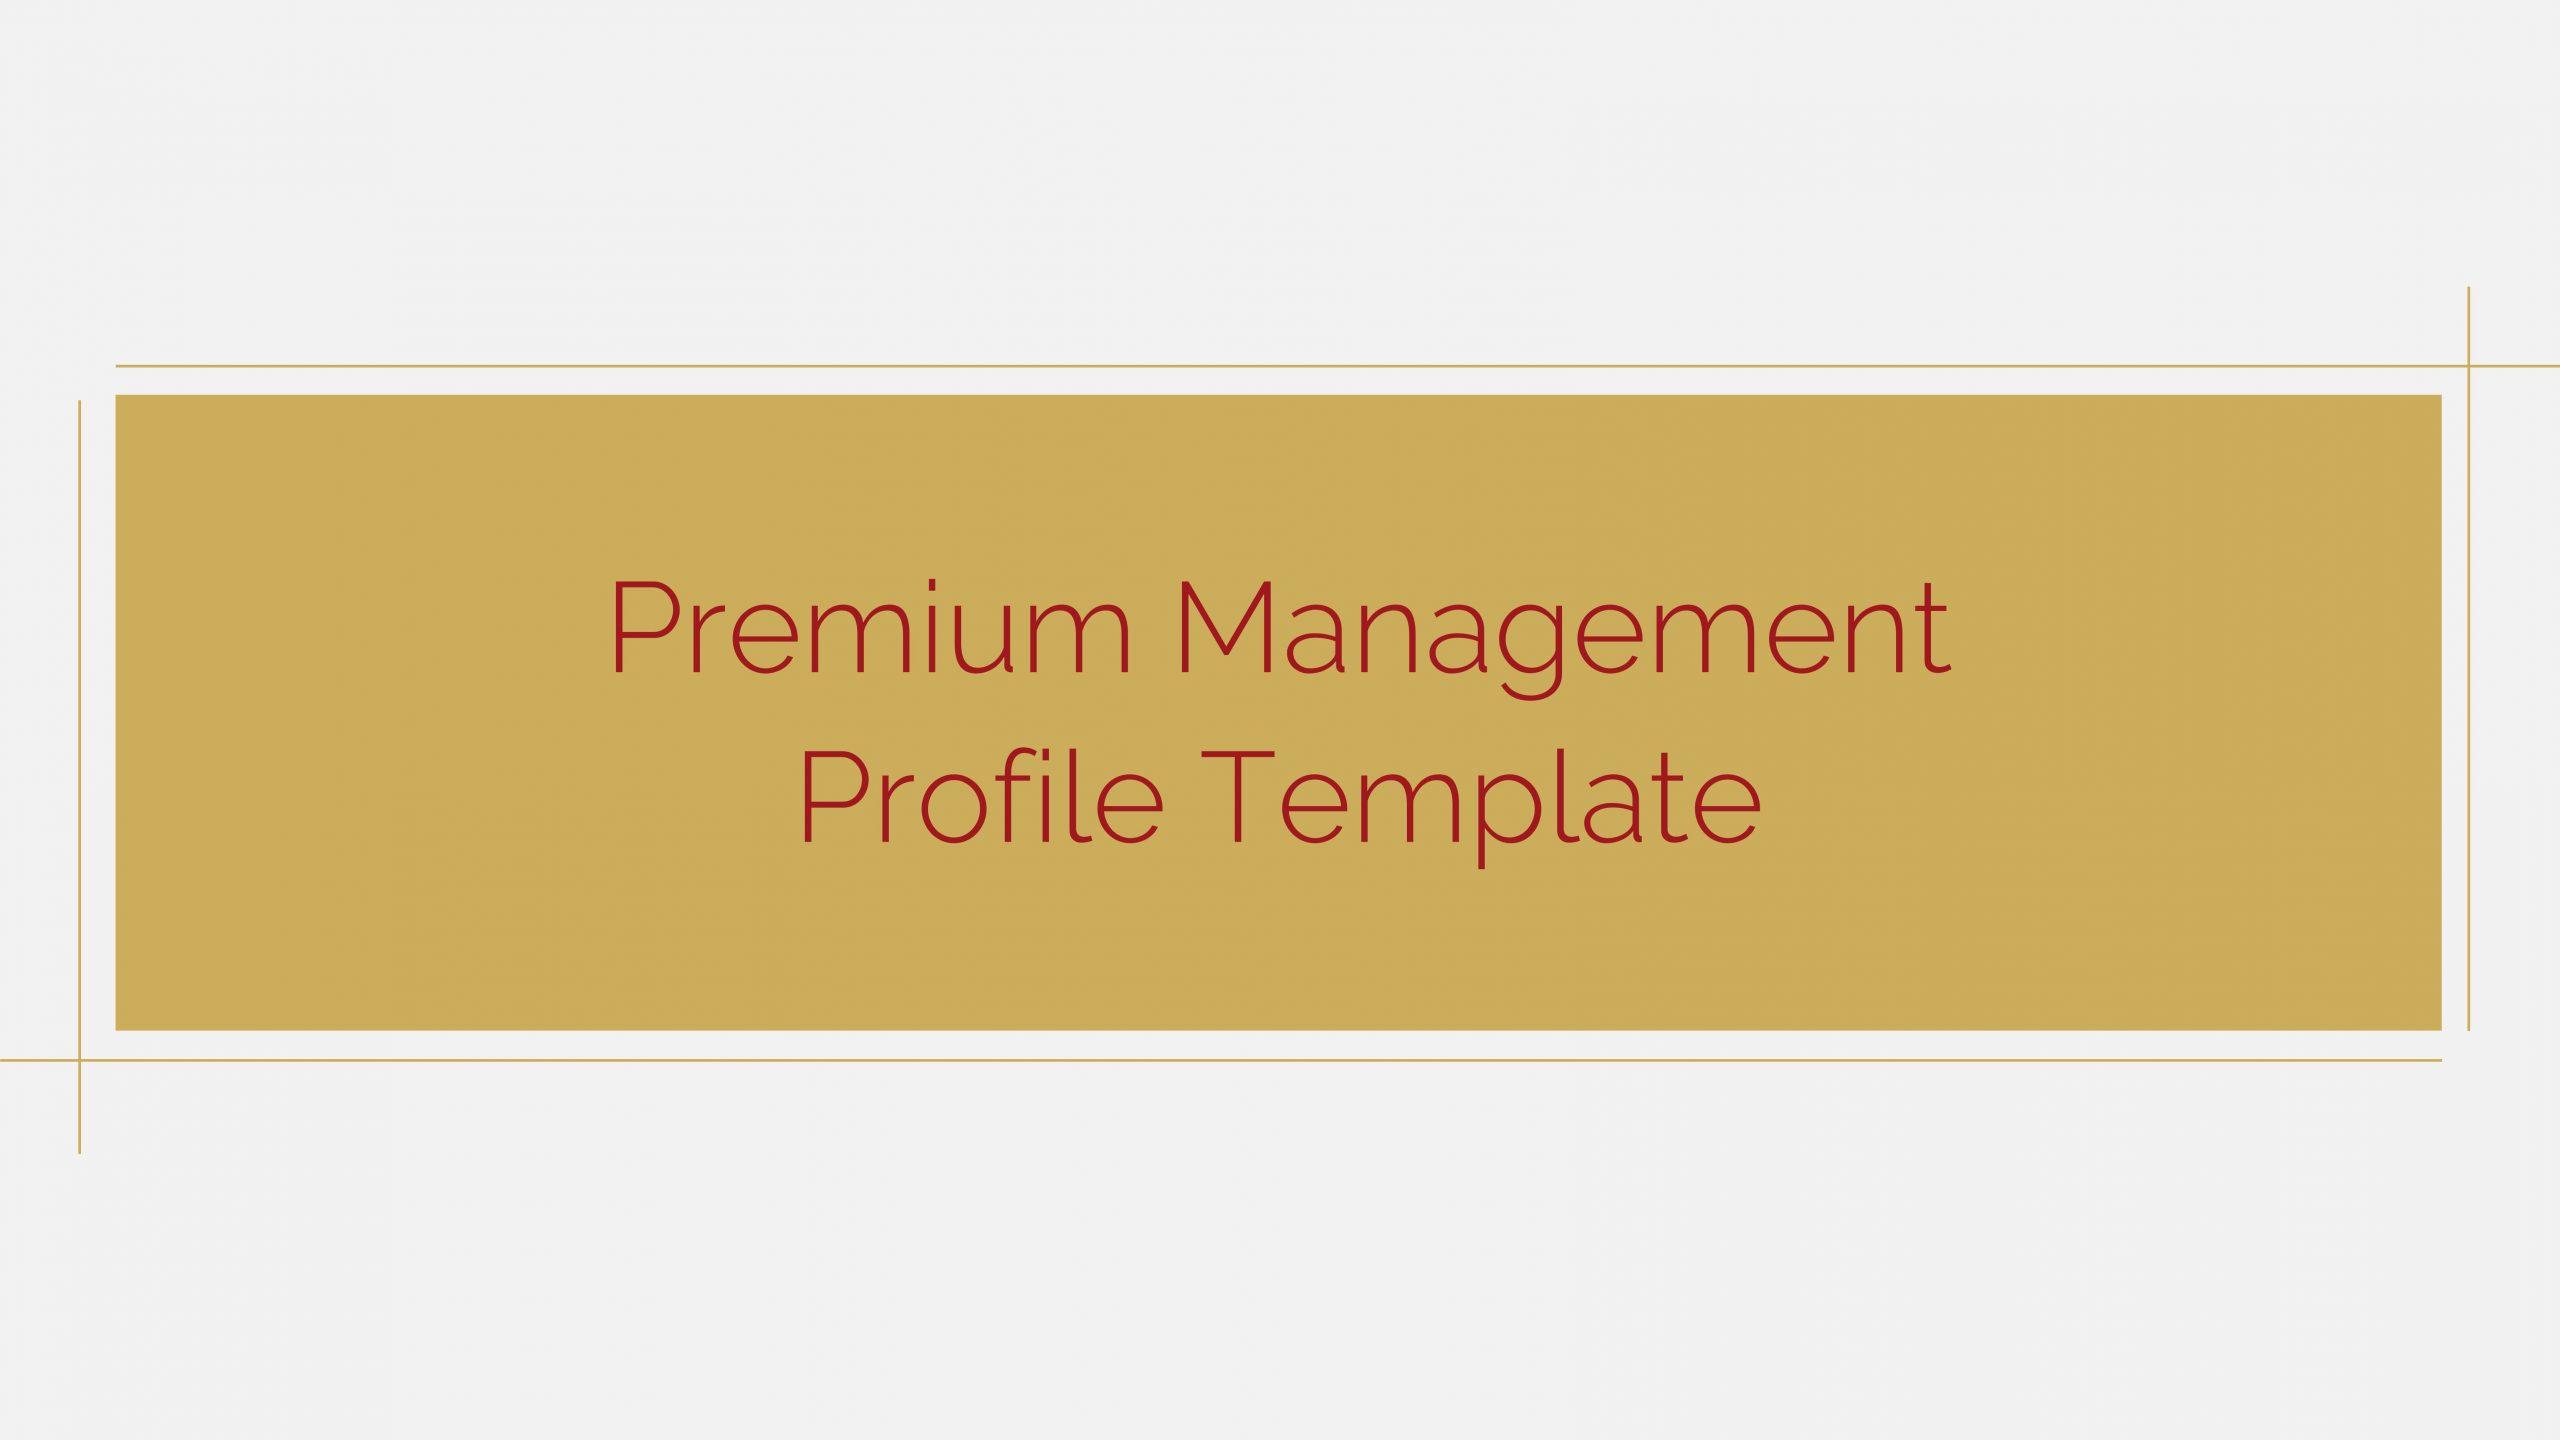 Download Free presentation template of Premium Management Profile